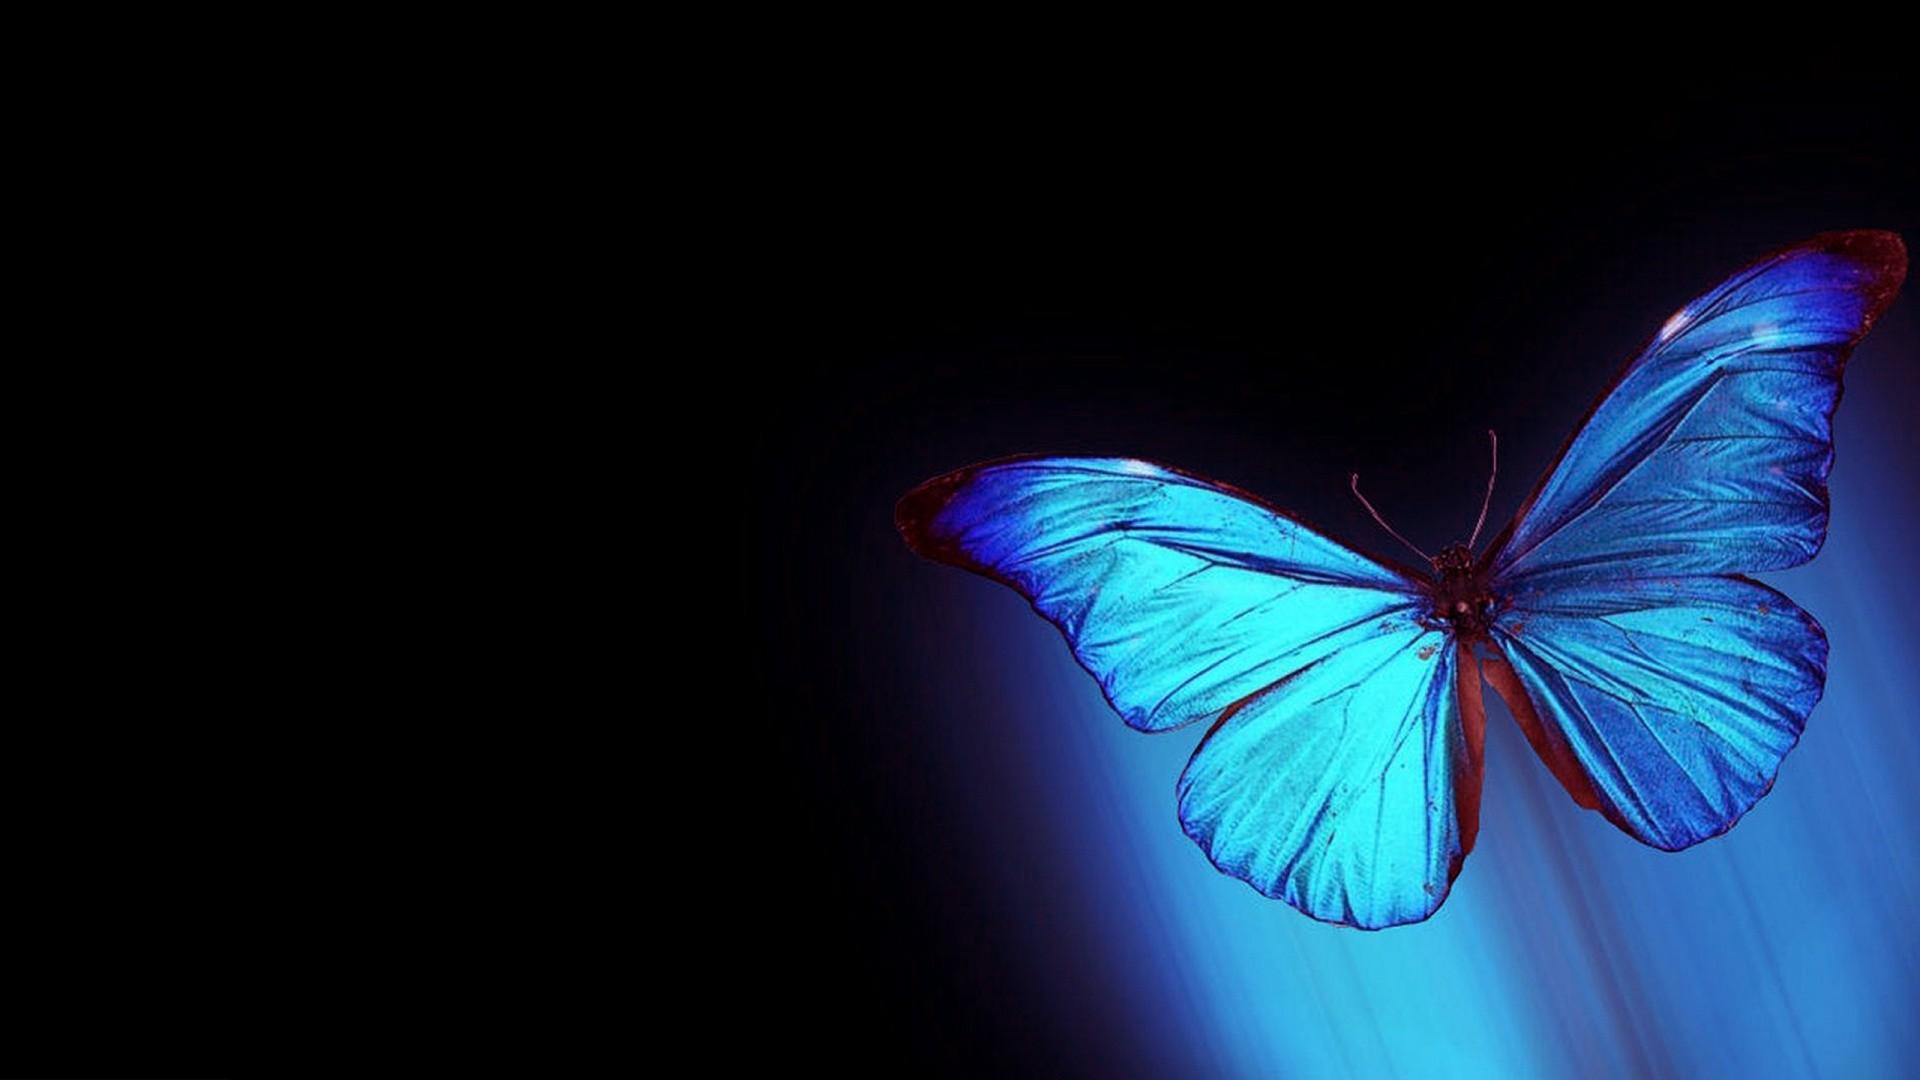 68 Butterfly Desktop Wallpapers on WallpaperPlay 1920x1080